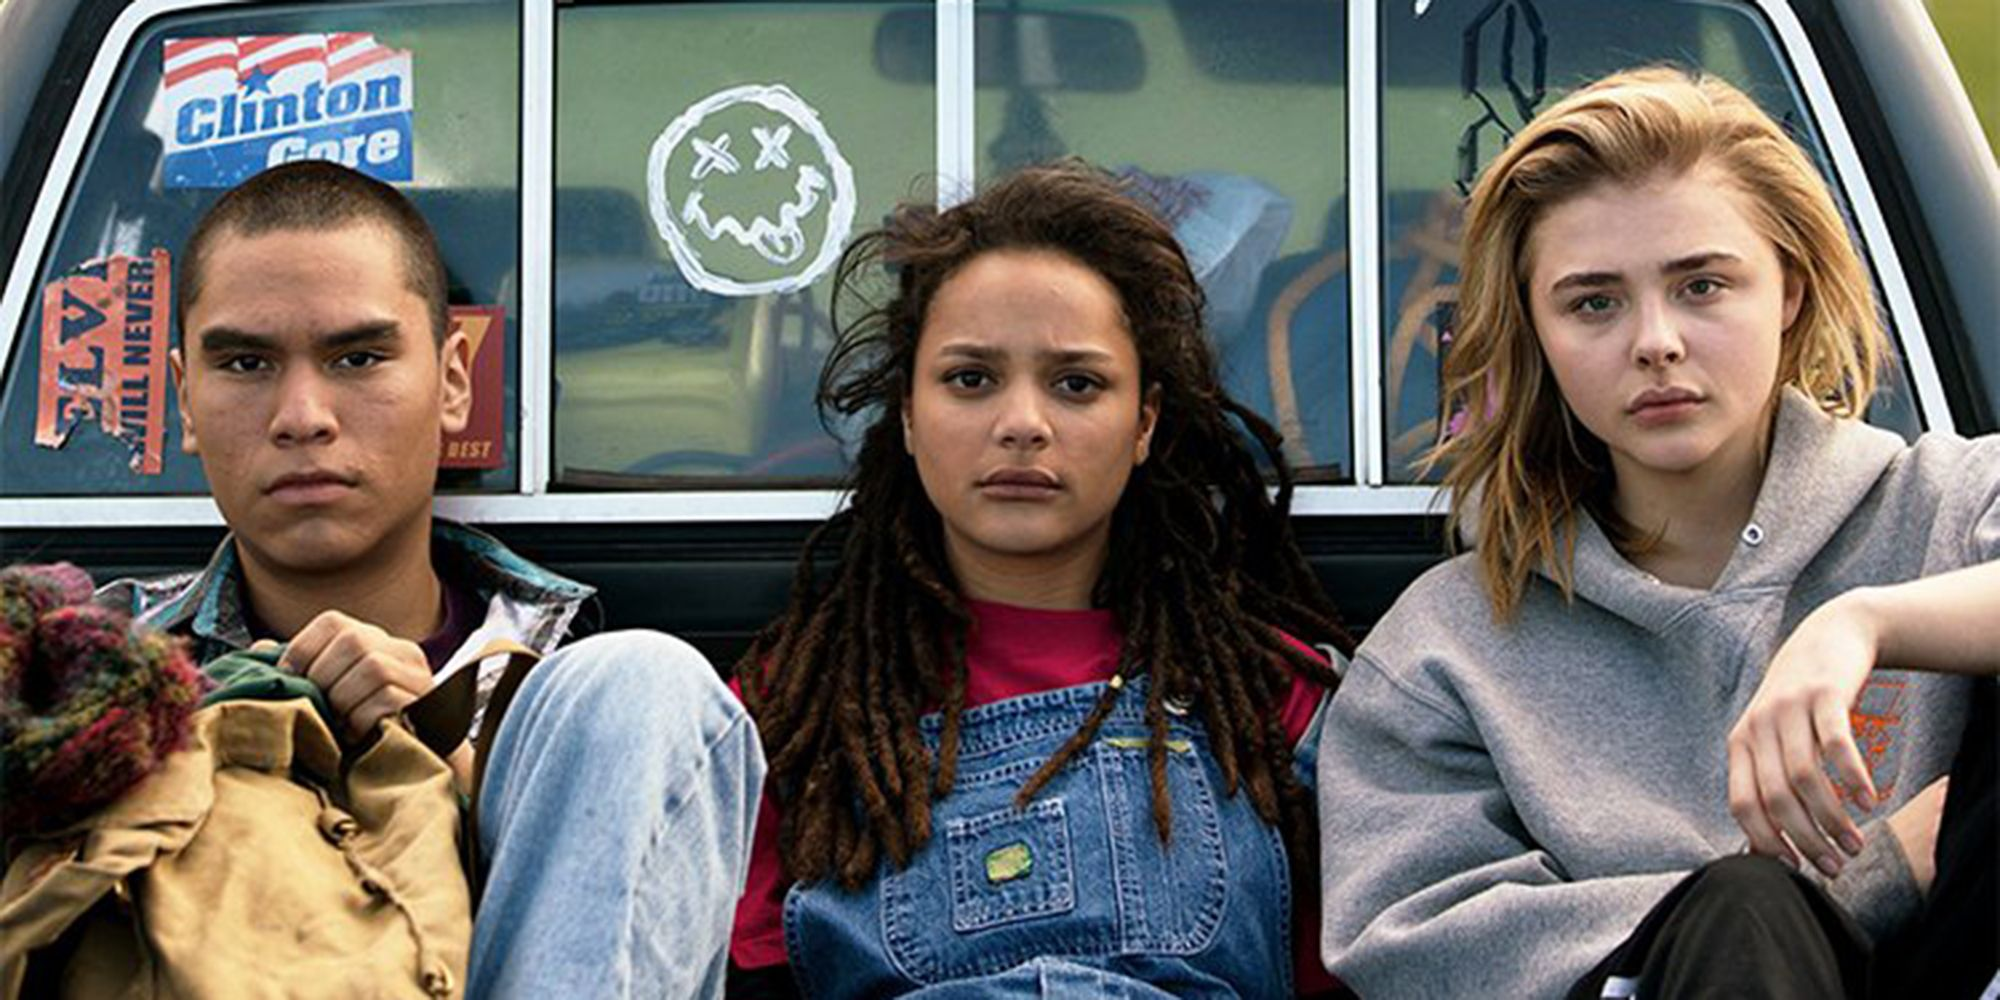 LGBTQ+ representation in films and TV